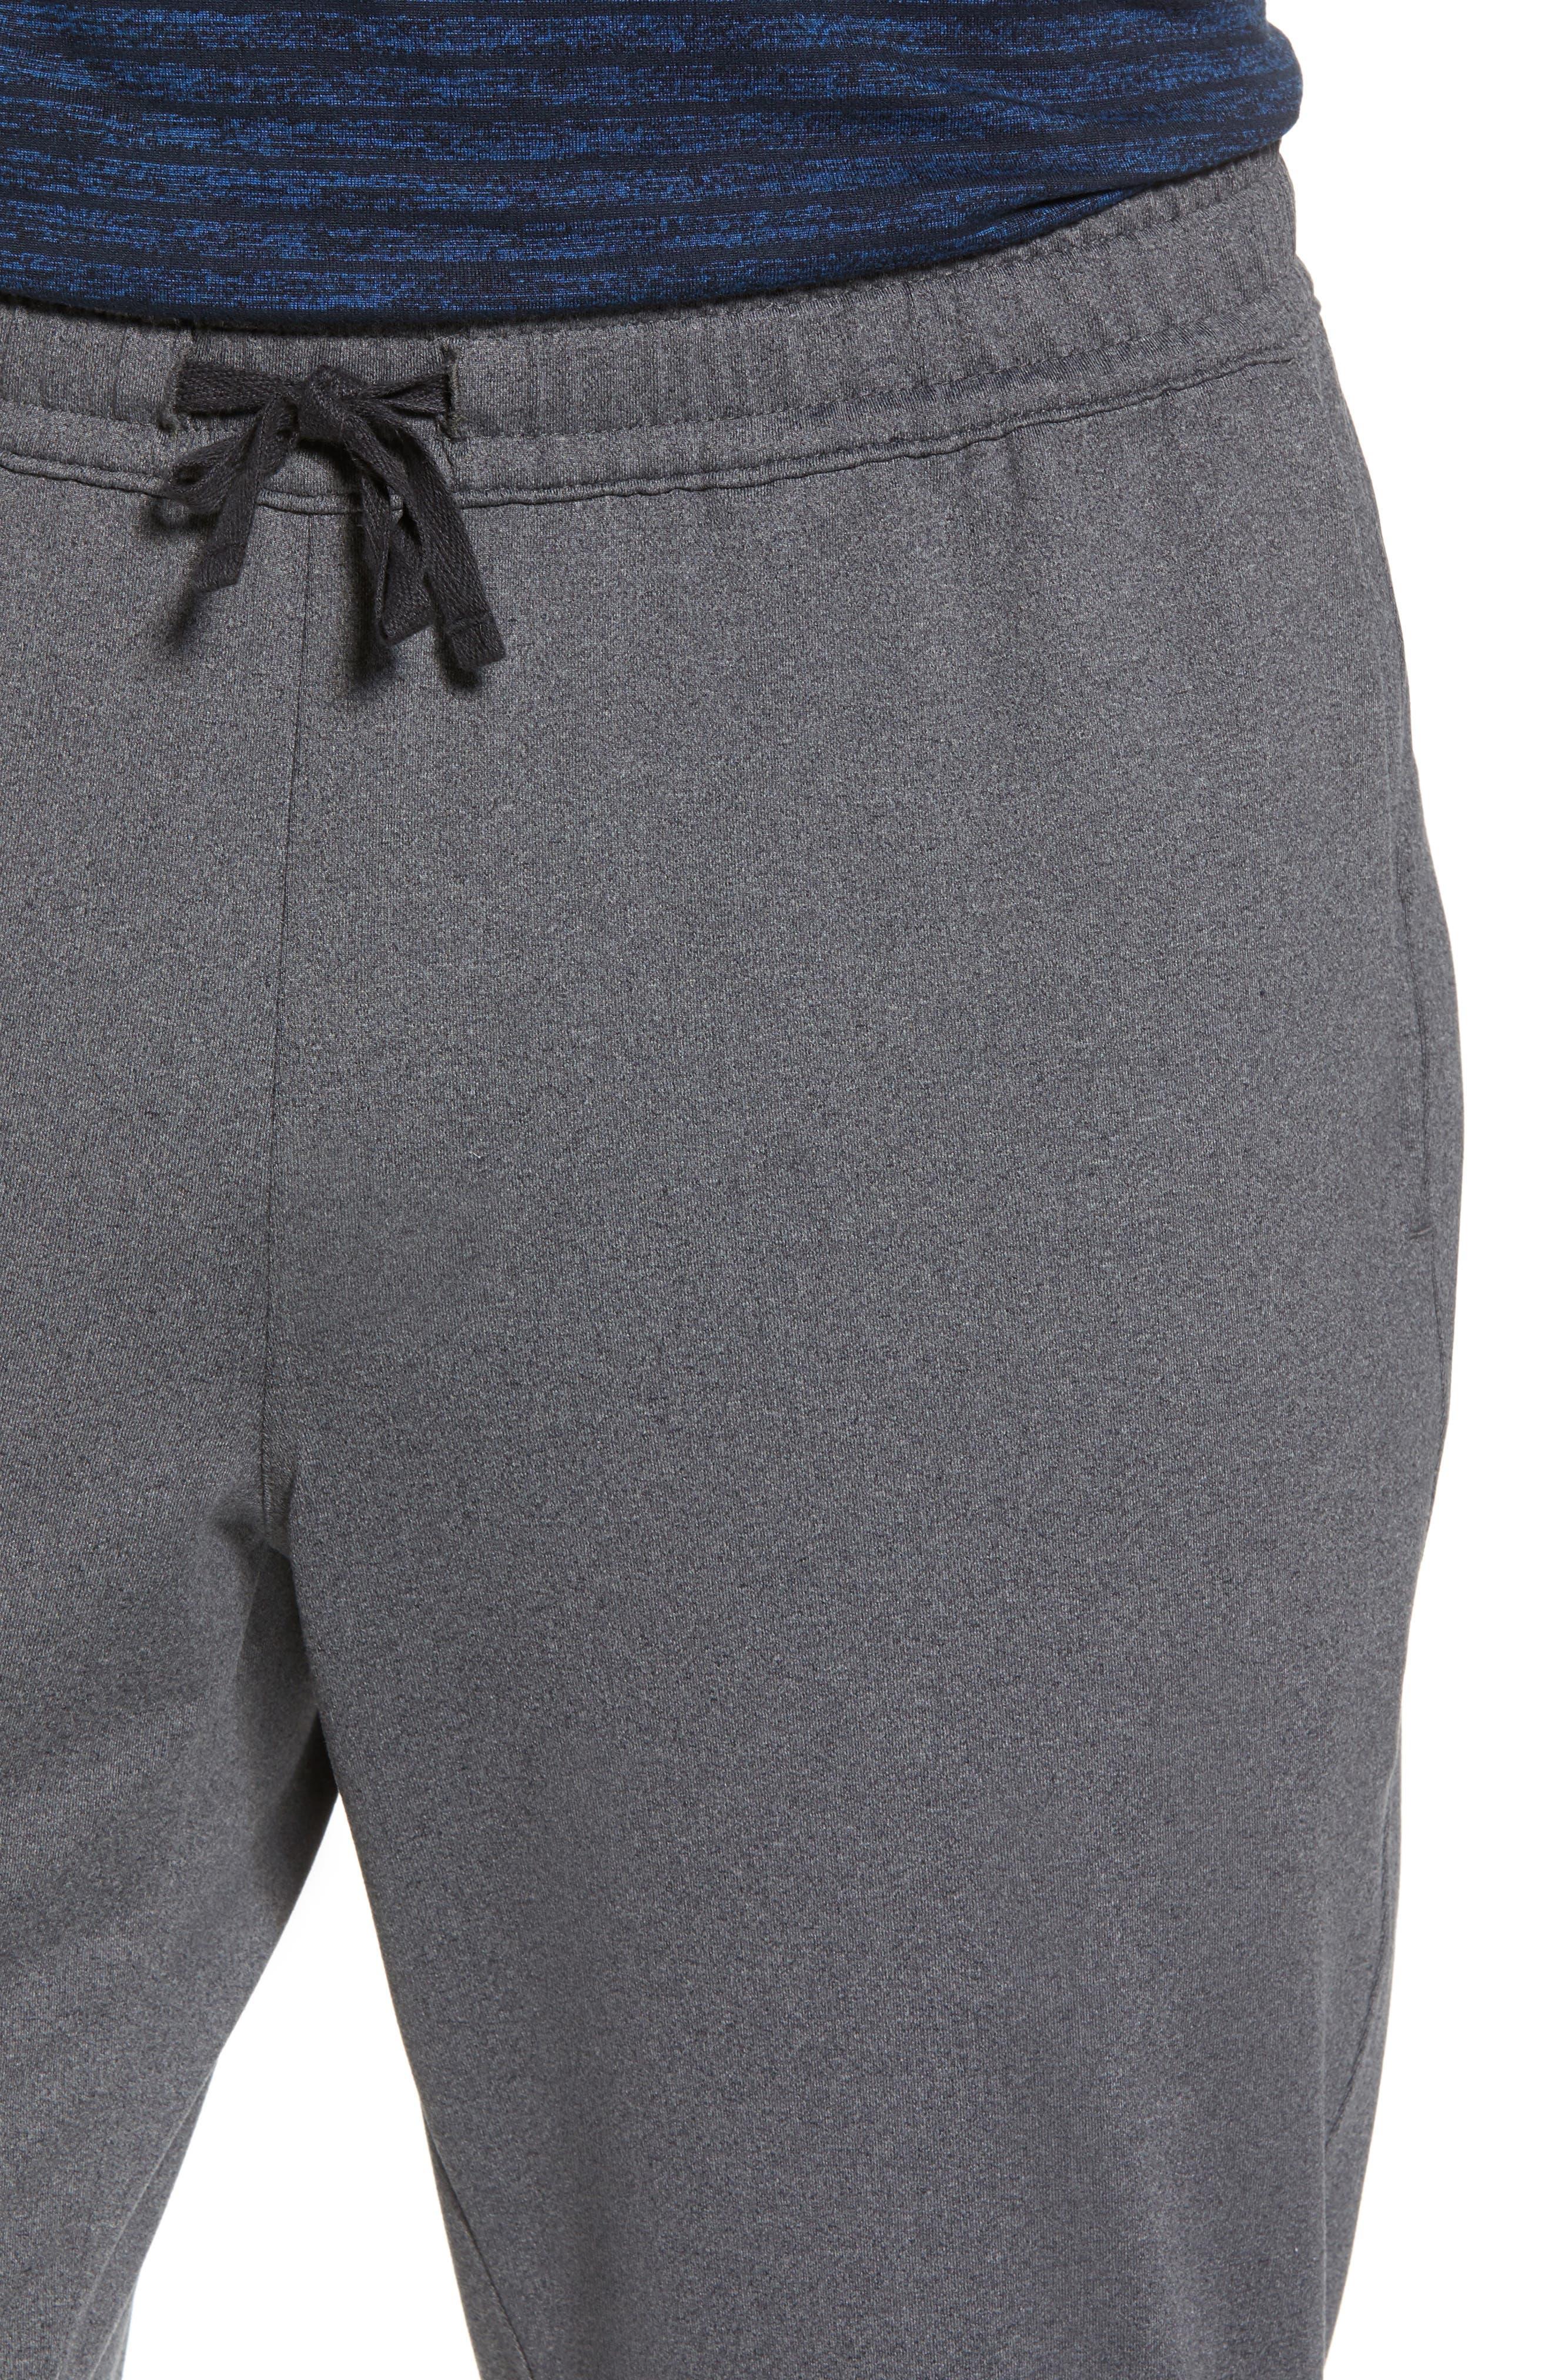 Active Crop Jogger Pants,                             Alternate thumbnail 4, color,                             Grey Obsidian Melange